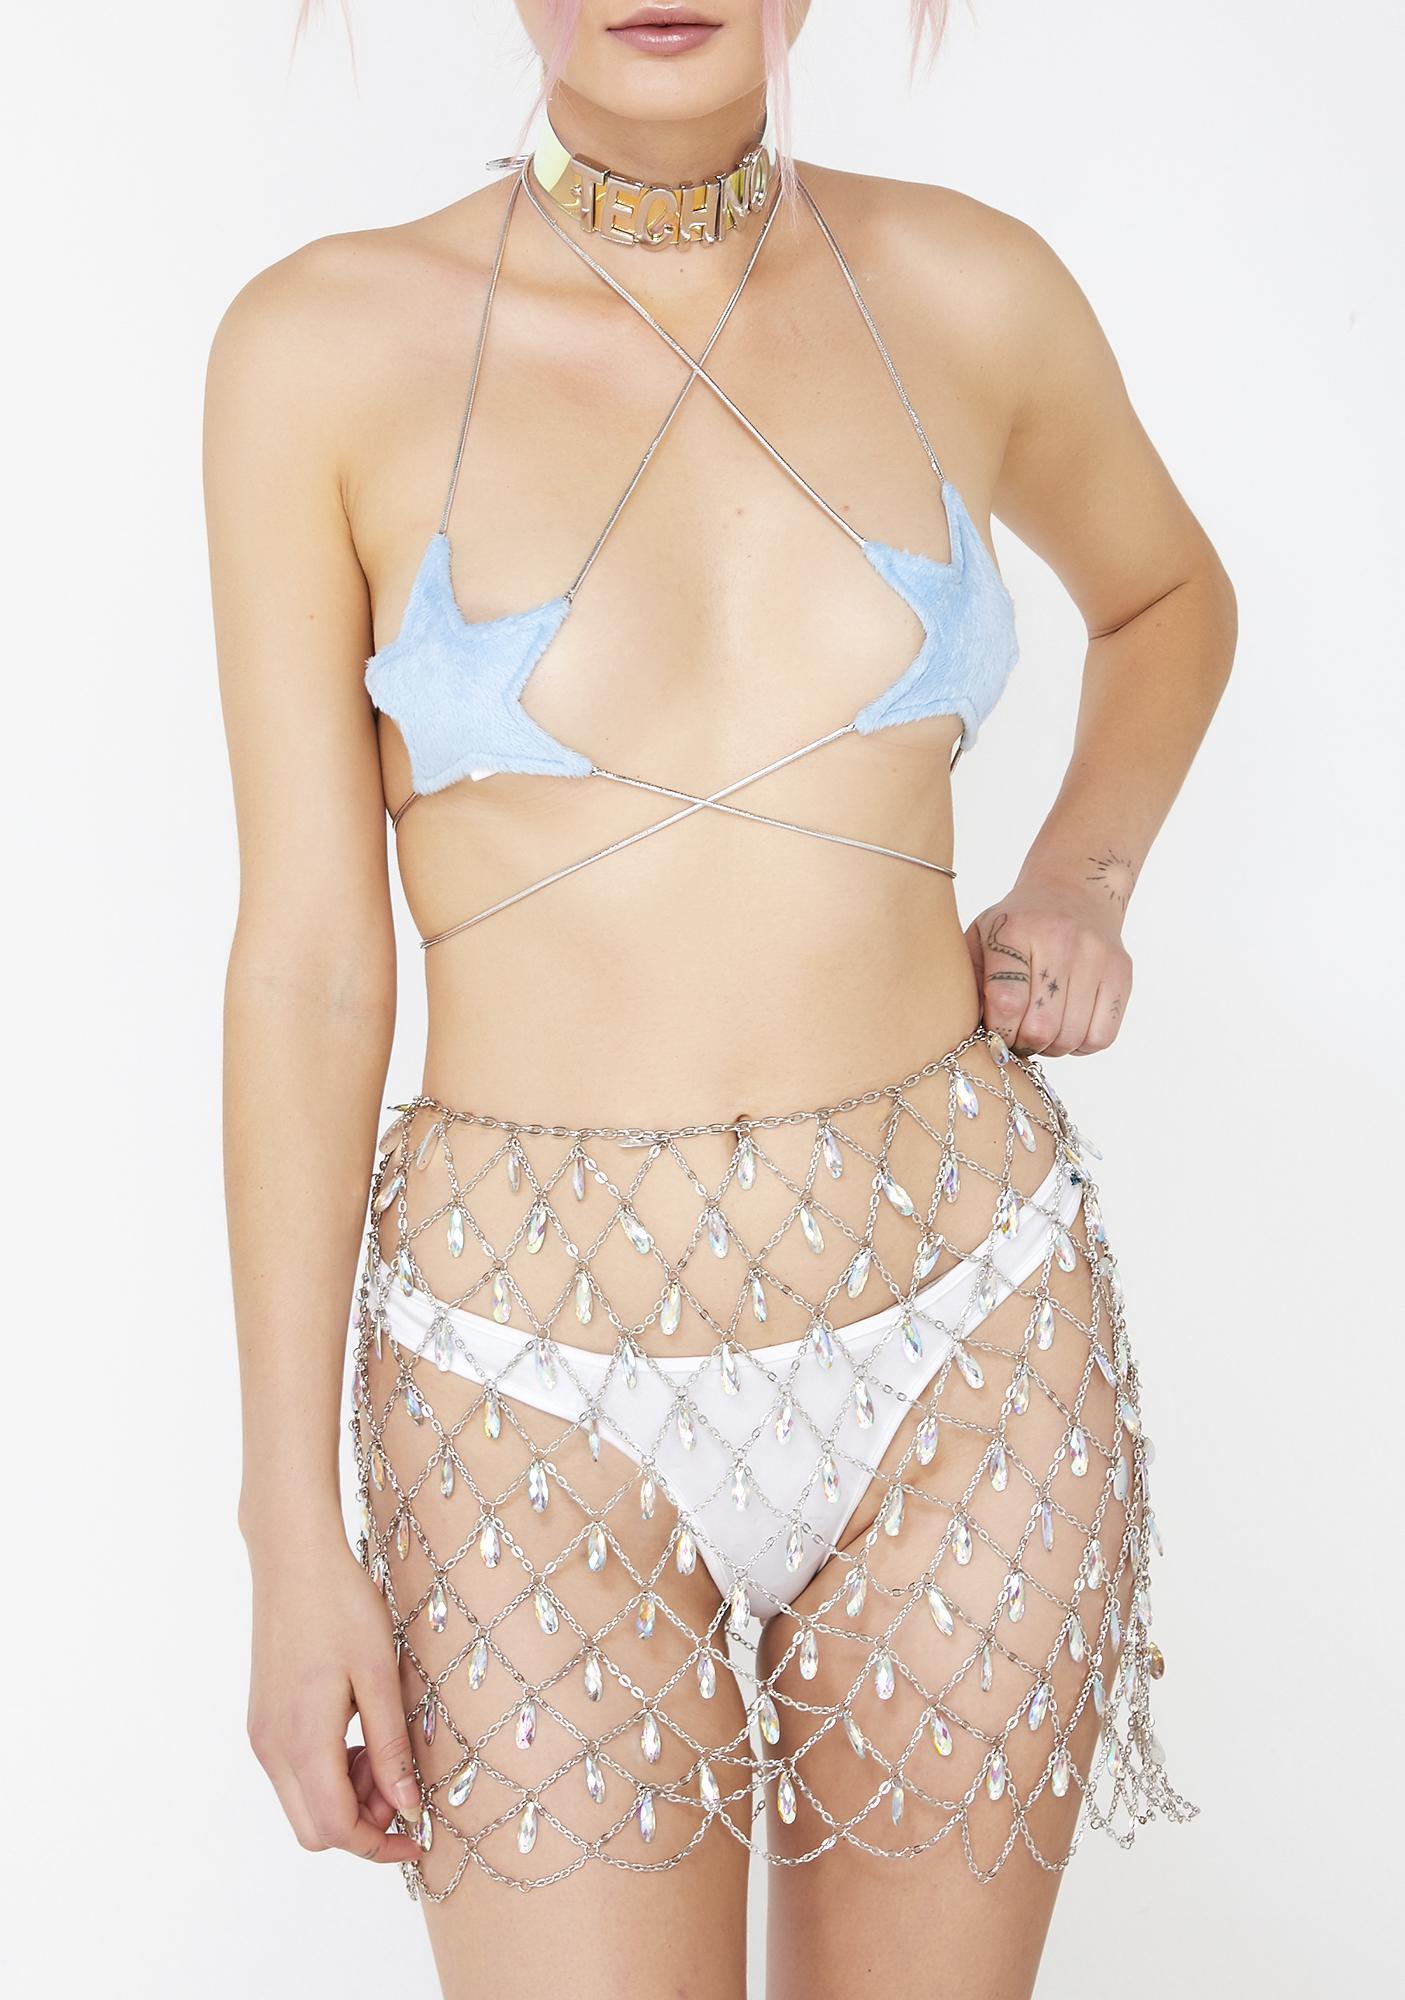 Club Exx Glam Goddess Chain Skirt